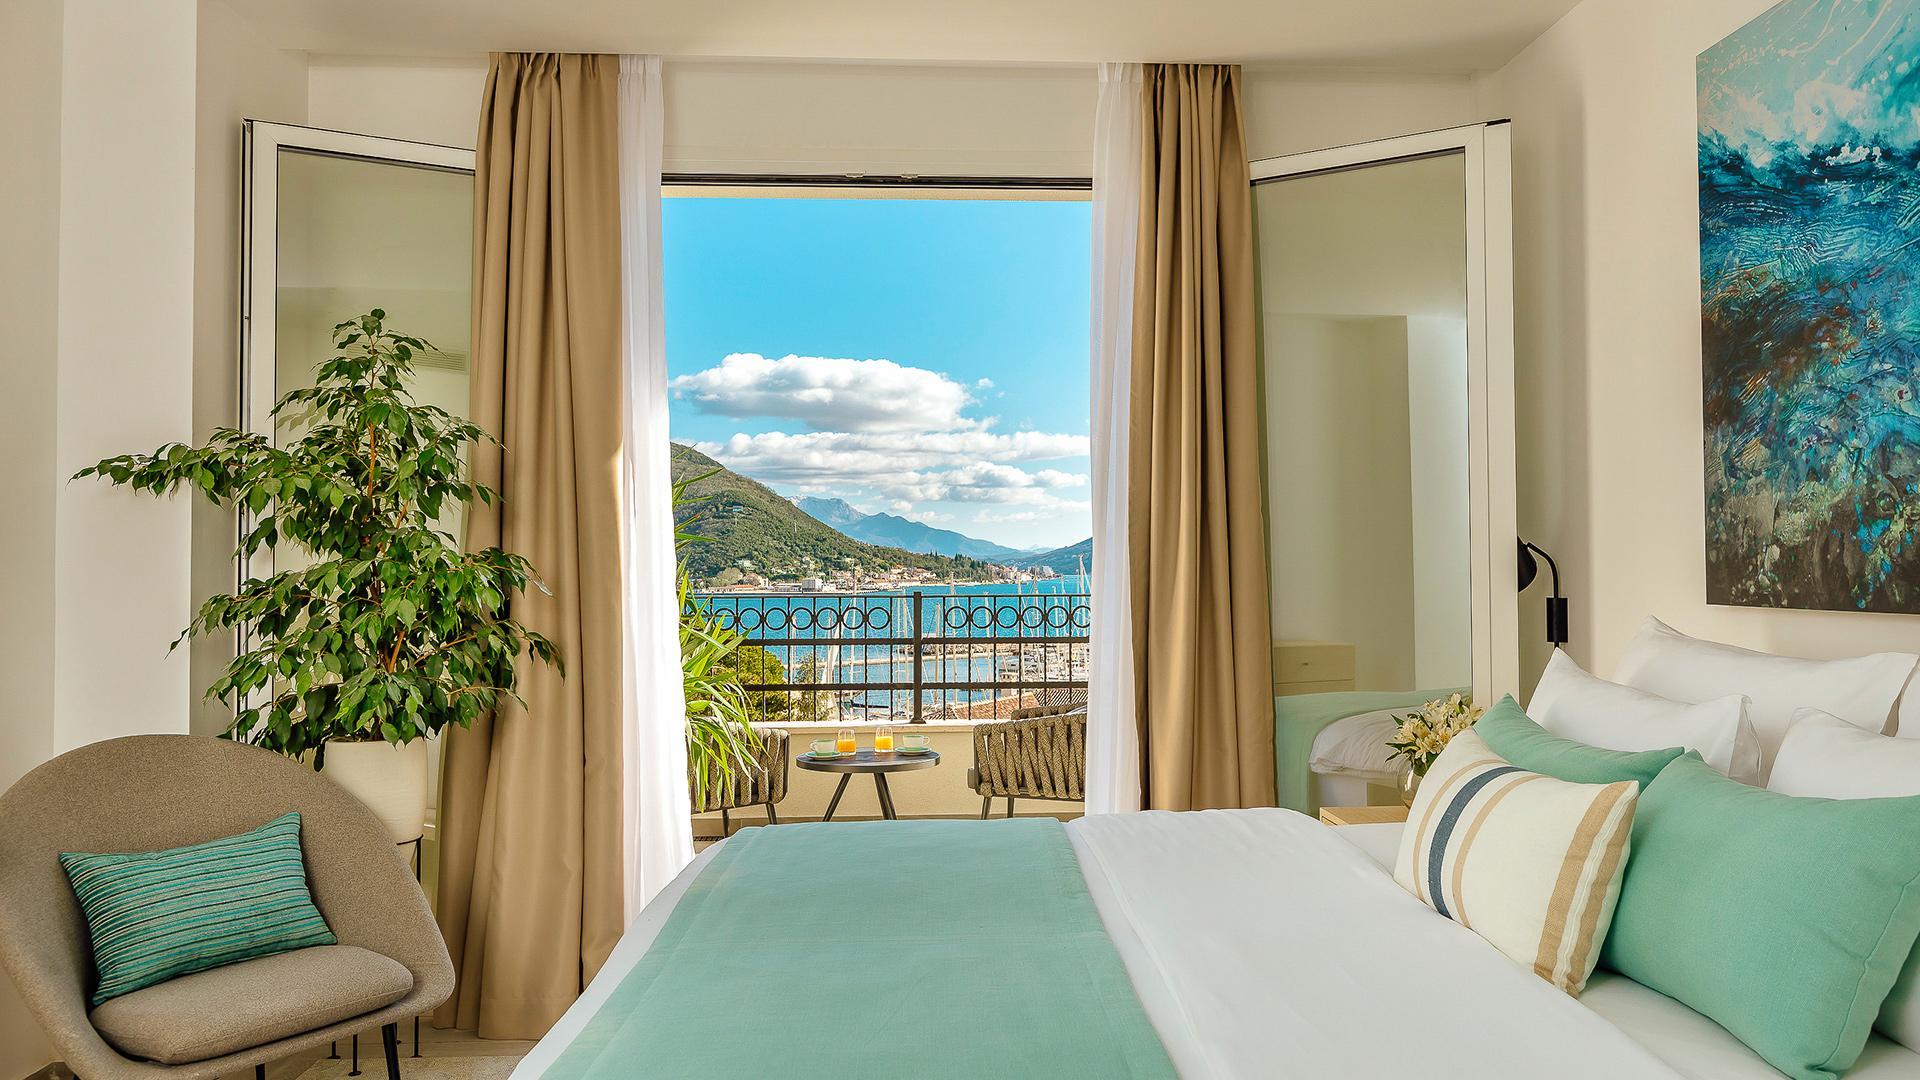 Deluxe Room Sea View image 1 at Lazure Marina & Hotel by null, Herceg Novi Municipality, Montenegro